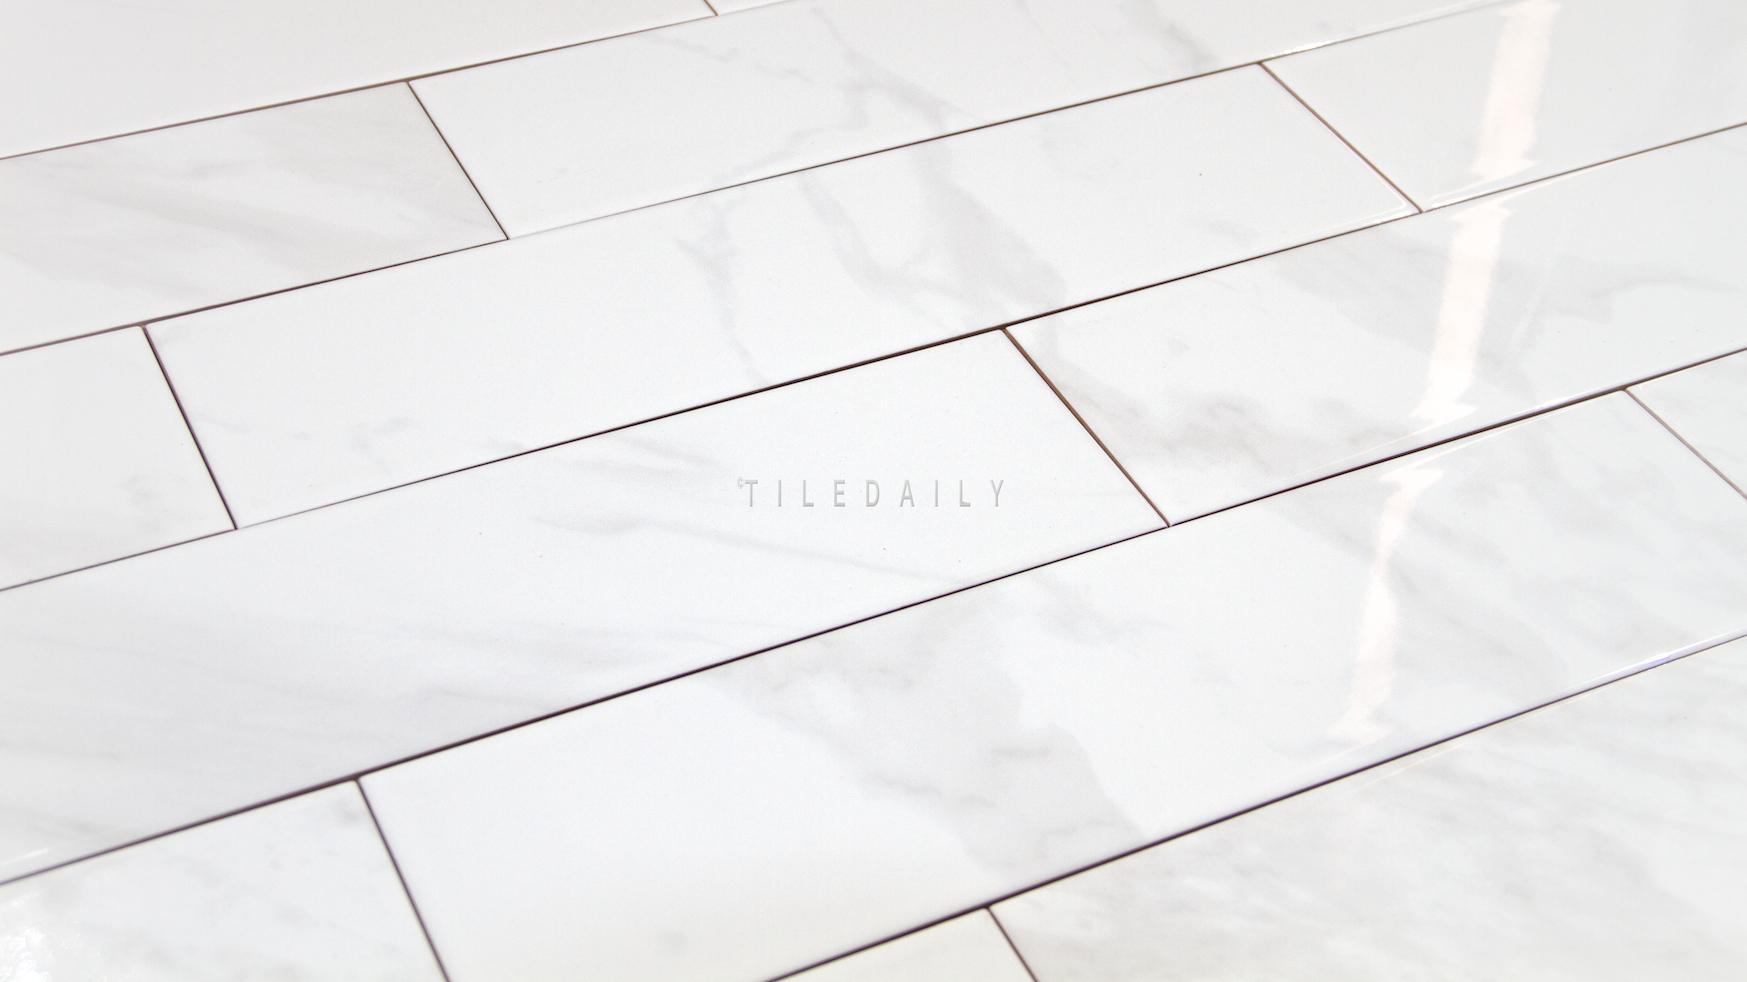 Carrara tiledaily 4x16 white carrara ceramic tiletiledaily10p0099we 4x16 white carrara ceramic tilep0099we 4x16 white carrara ceramic tilep0099we 4x16 white carrara doublecrazyfo Choice Image